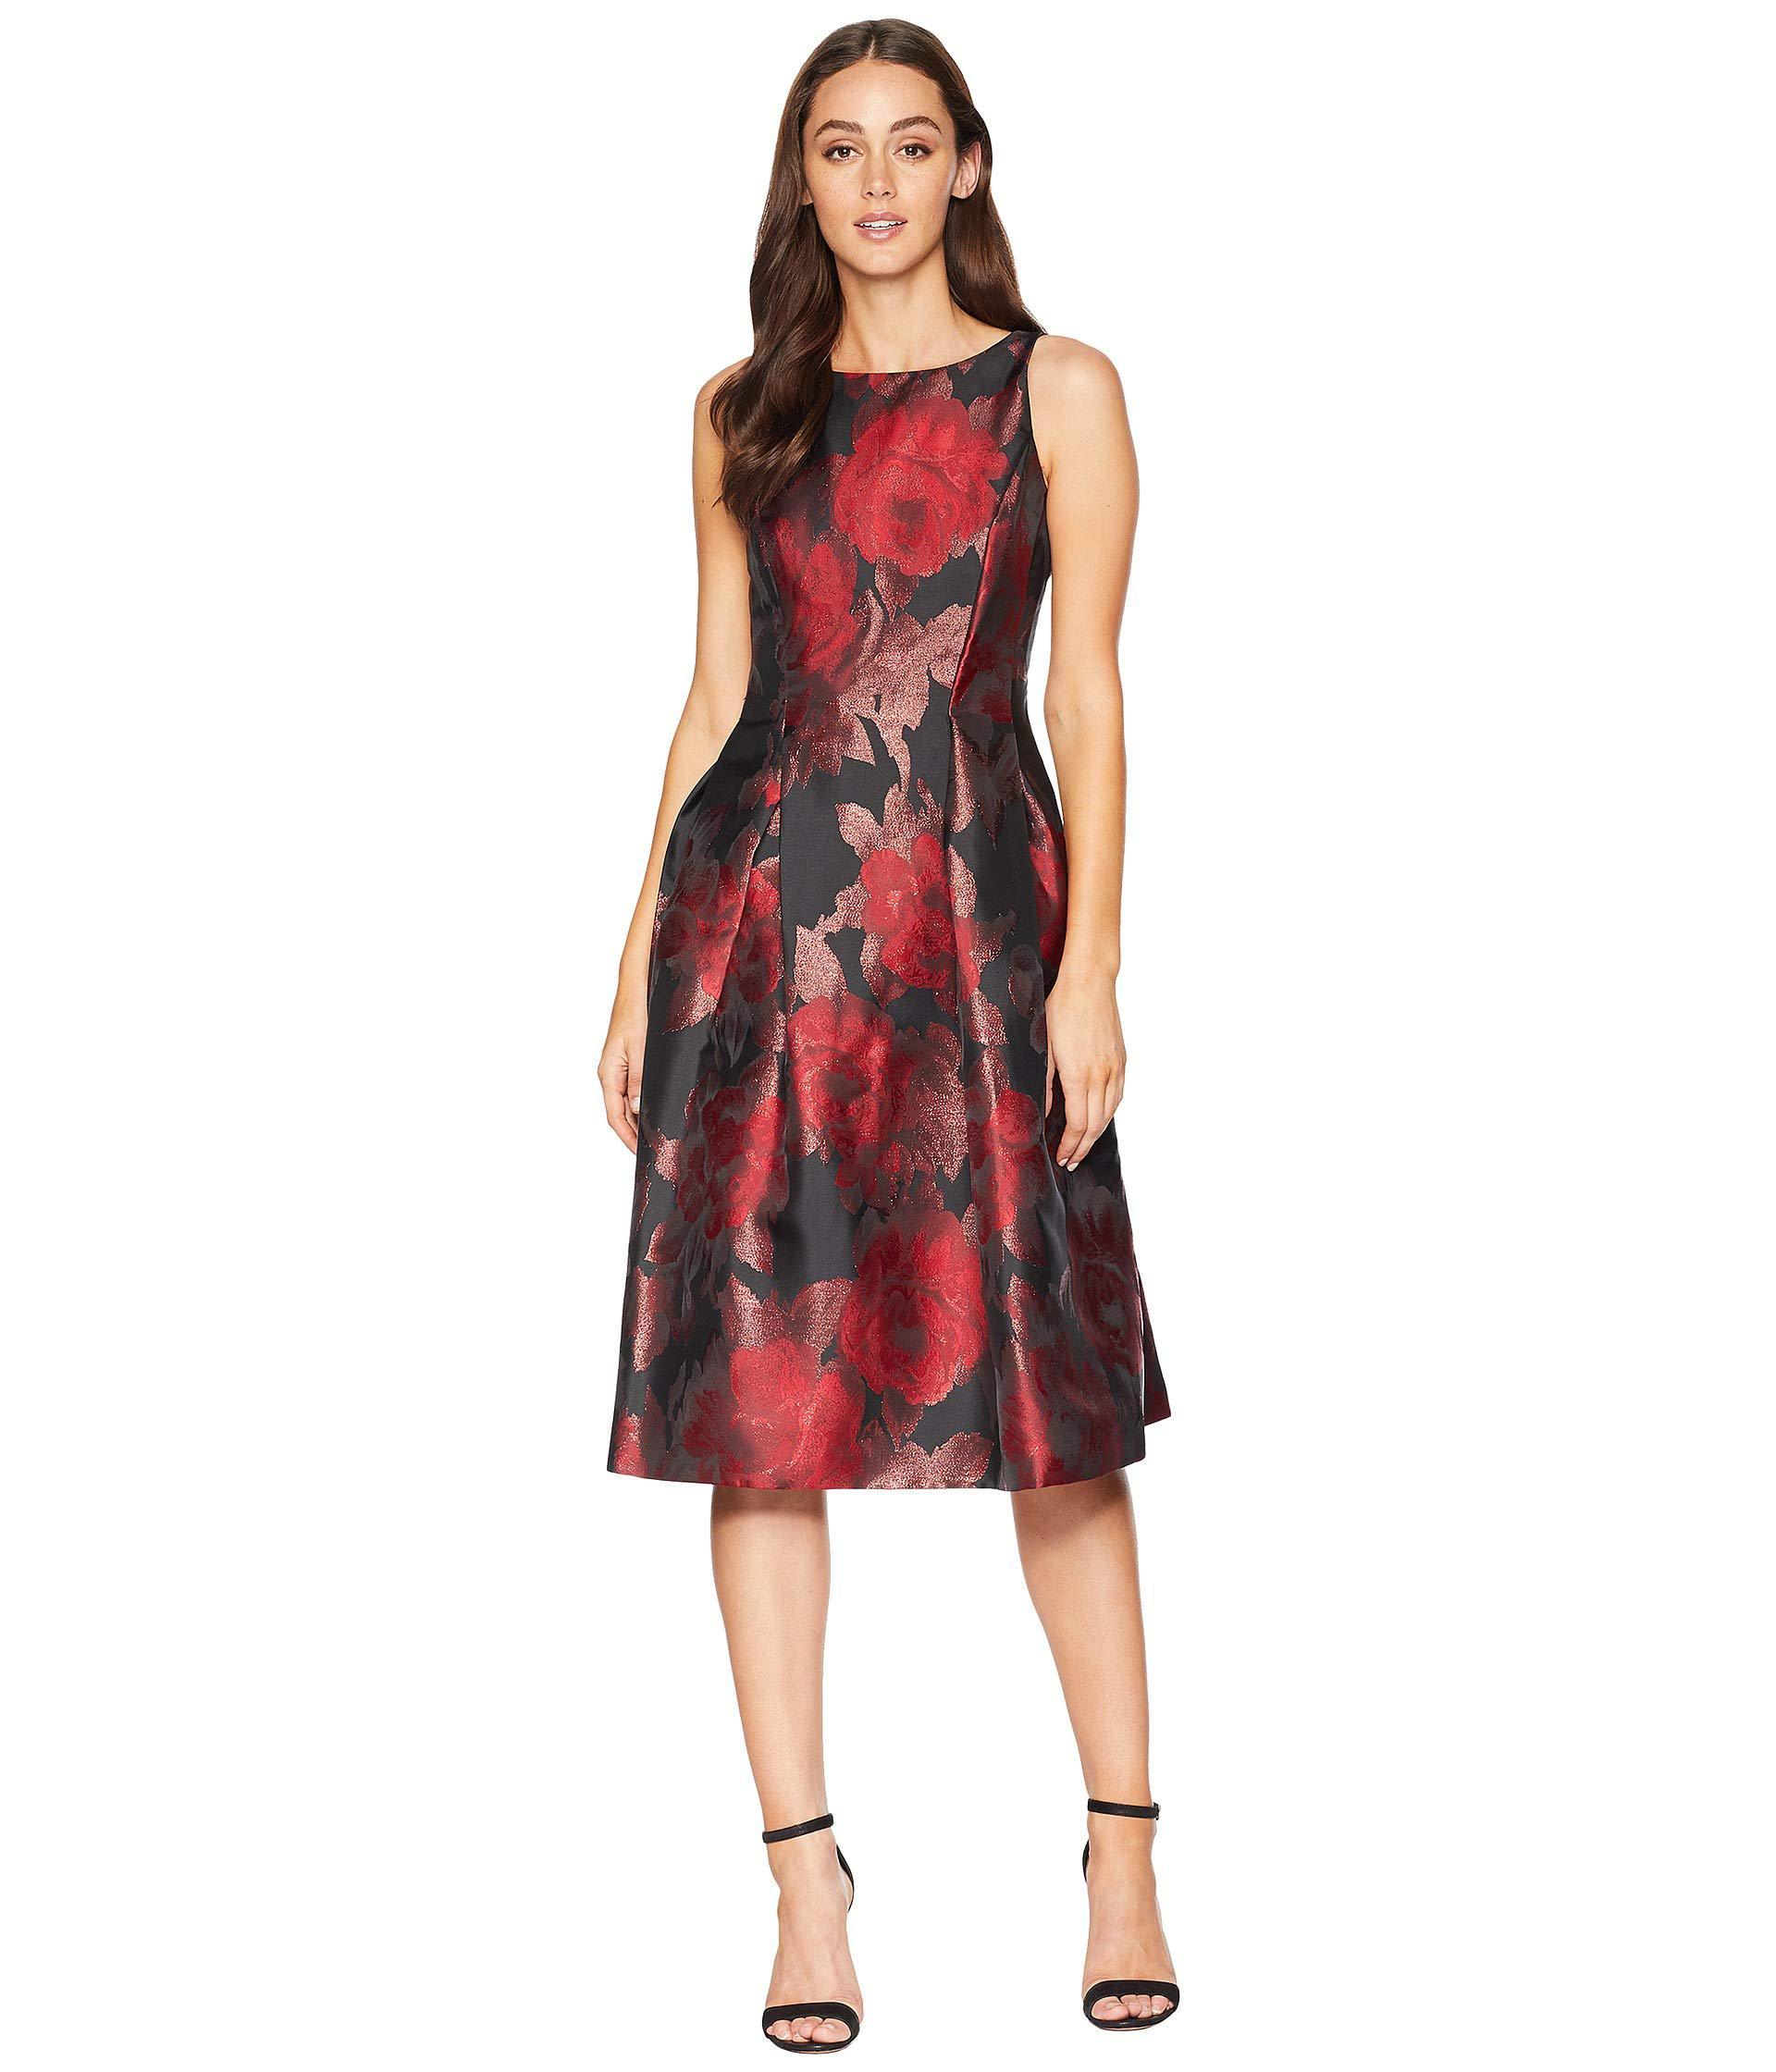 e05a909dc3a8 Tahari Tea-length Floral Metallic Jacquard Dress (black/red/copper ...